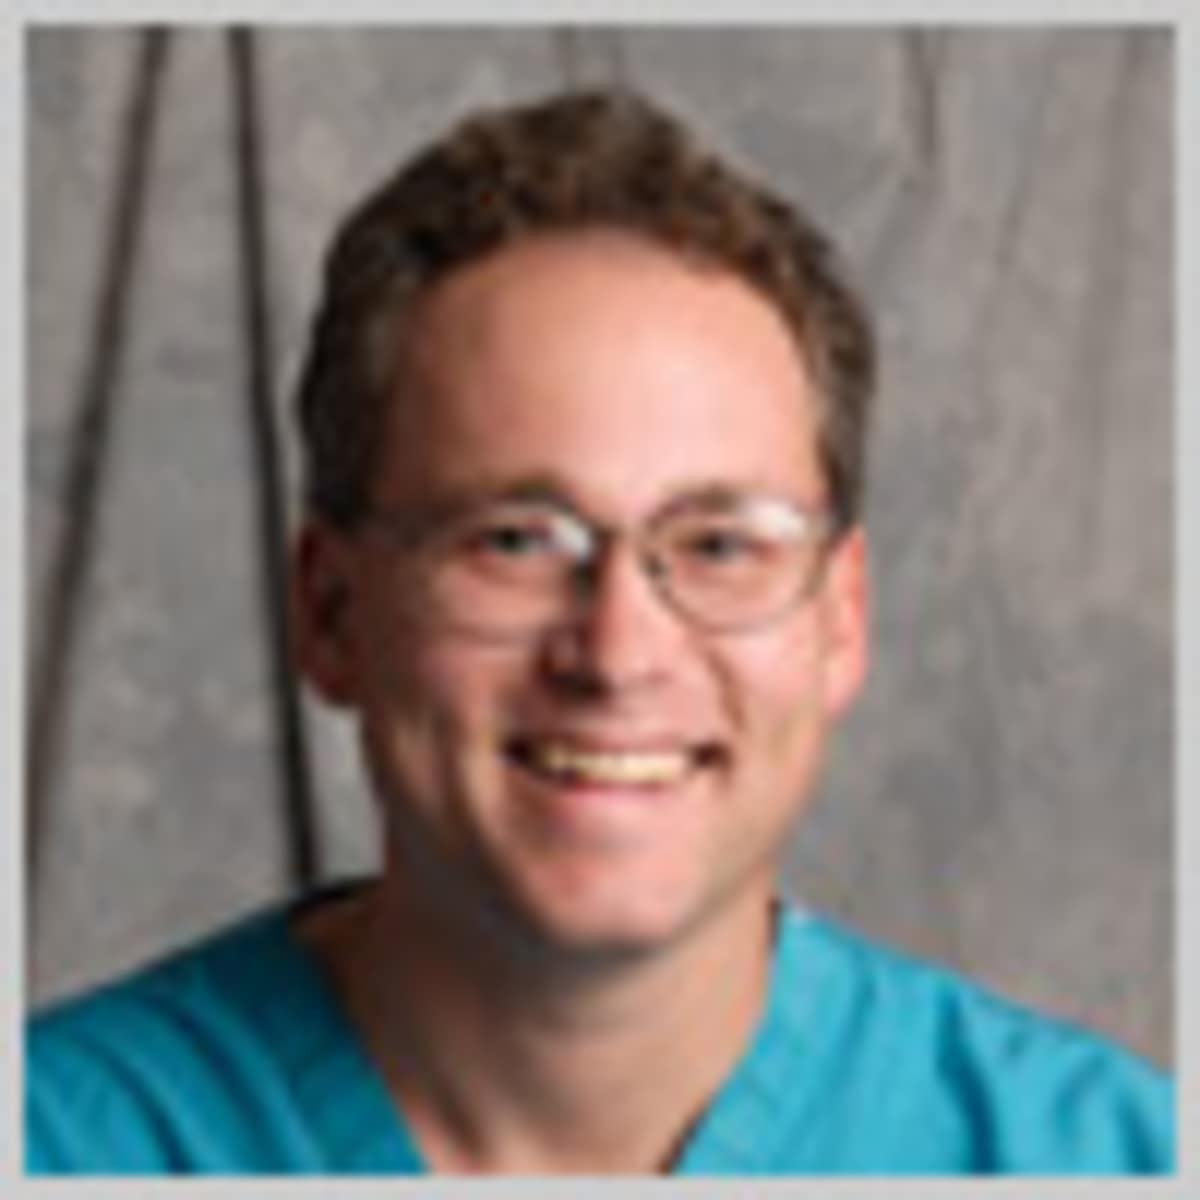 Dr Jeffrey Huth Md Lombard Il Diagnostic Radiologist